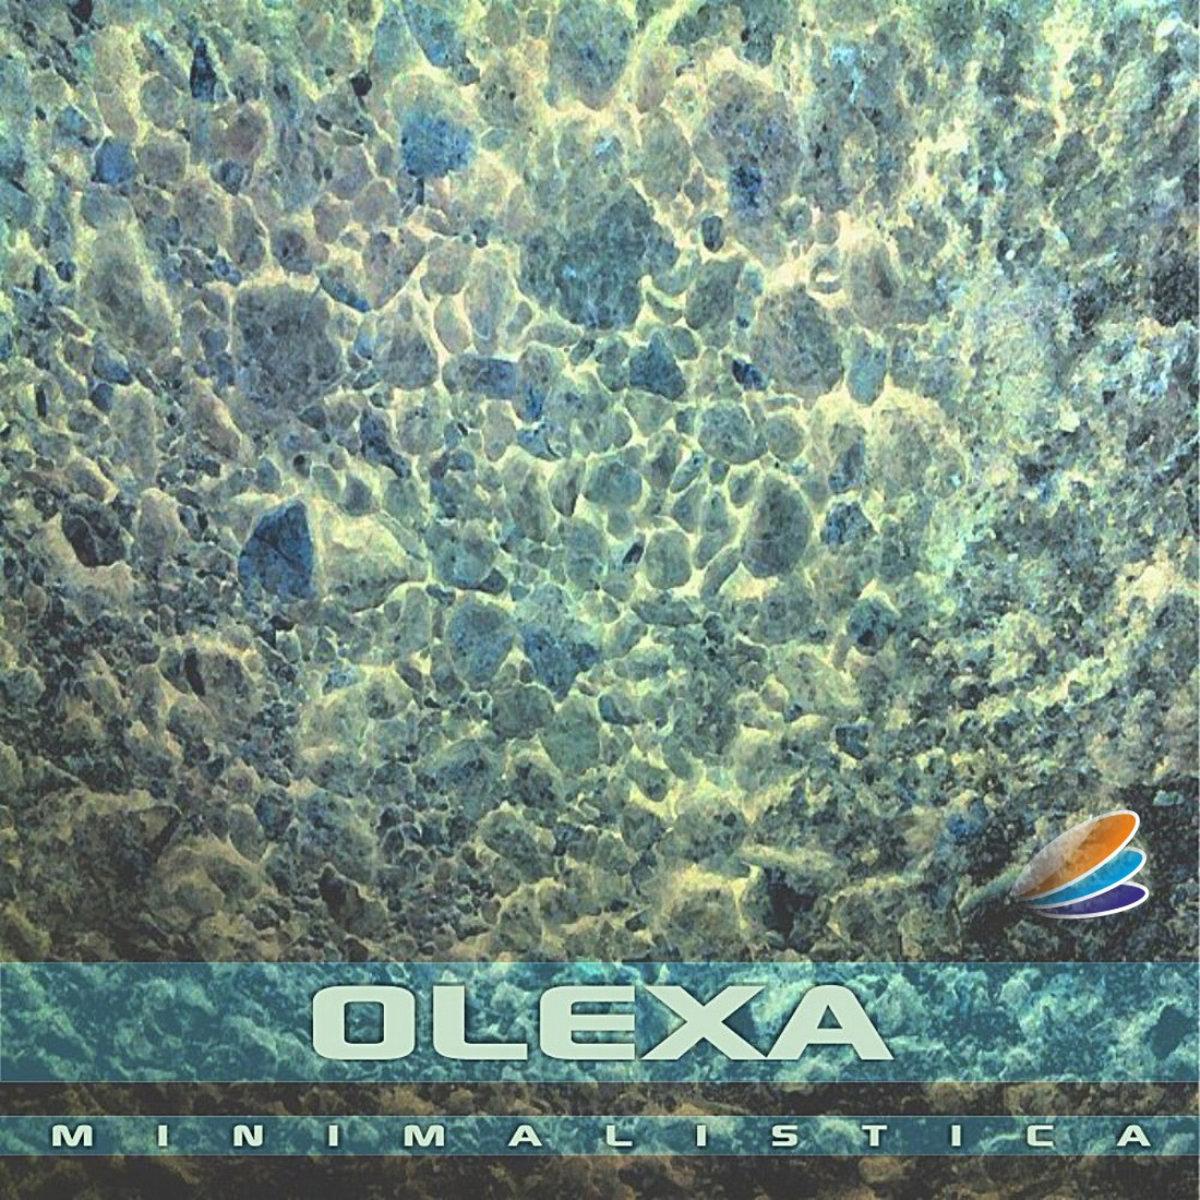 Olexa - Minimalistica